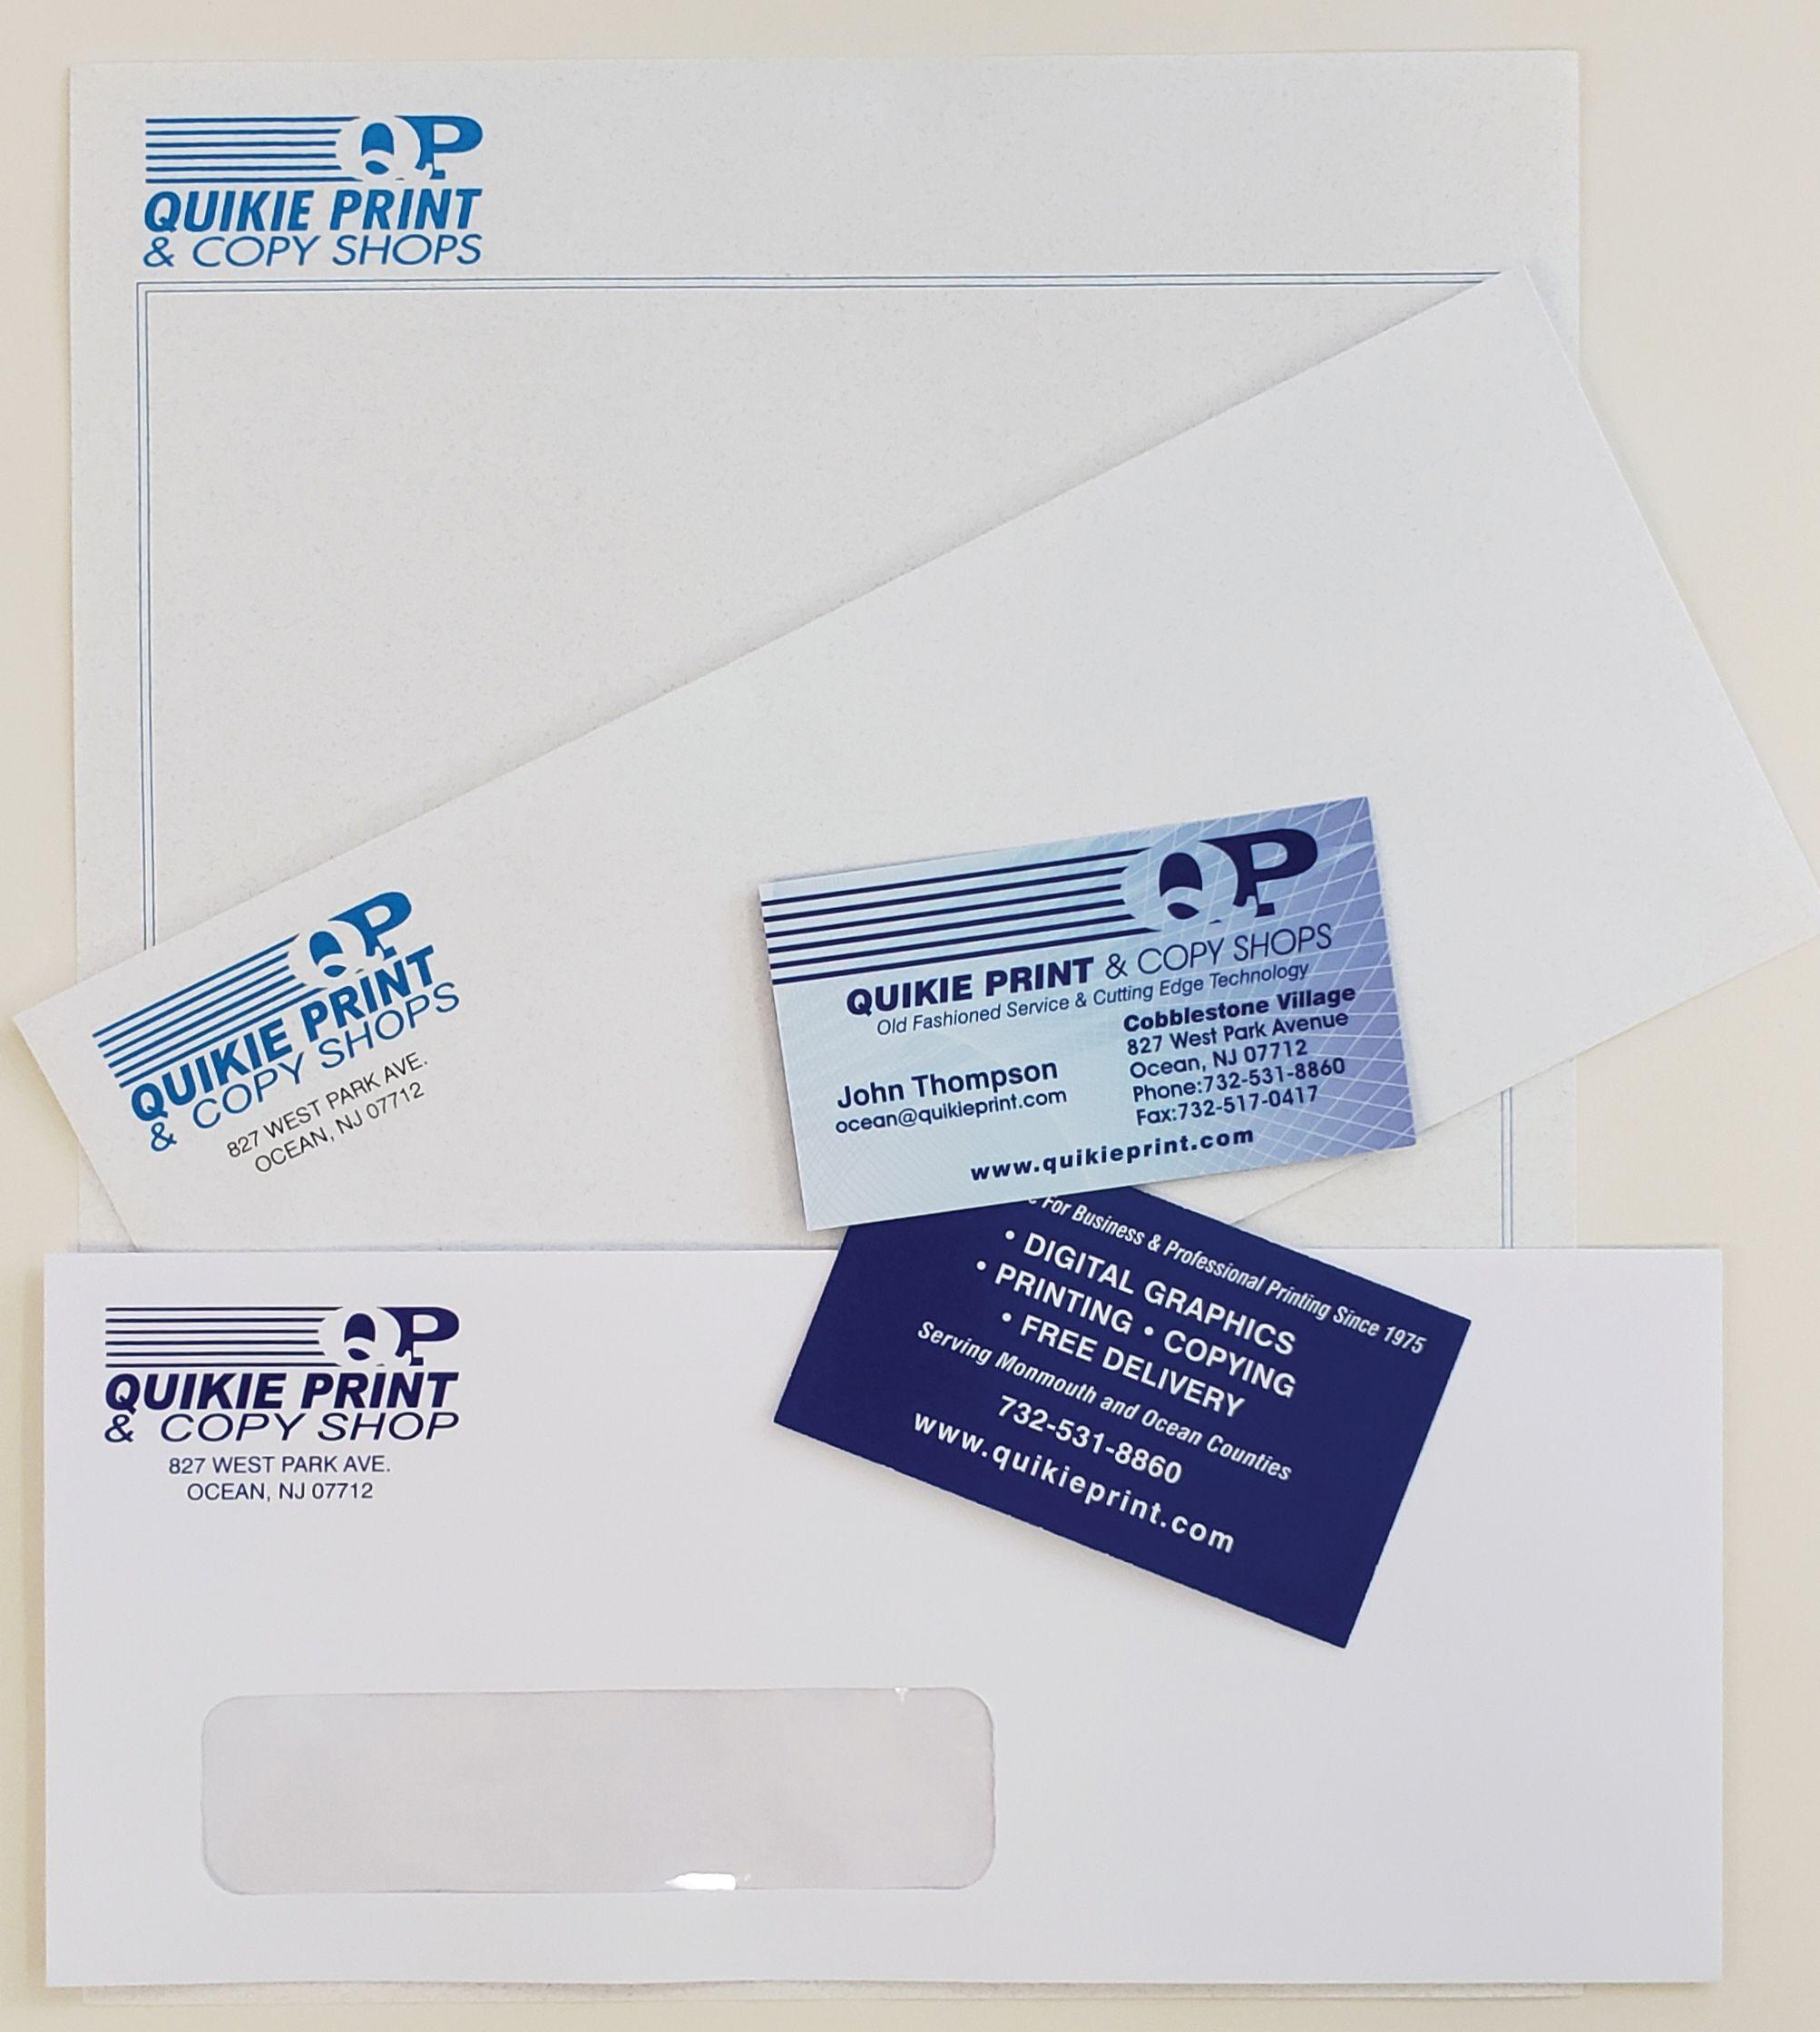 Stationary - Letterhead, Envelopes, Business Cards